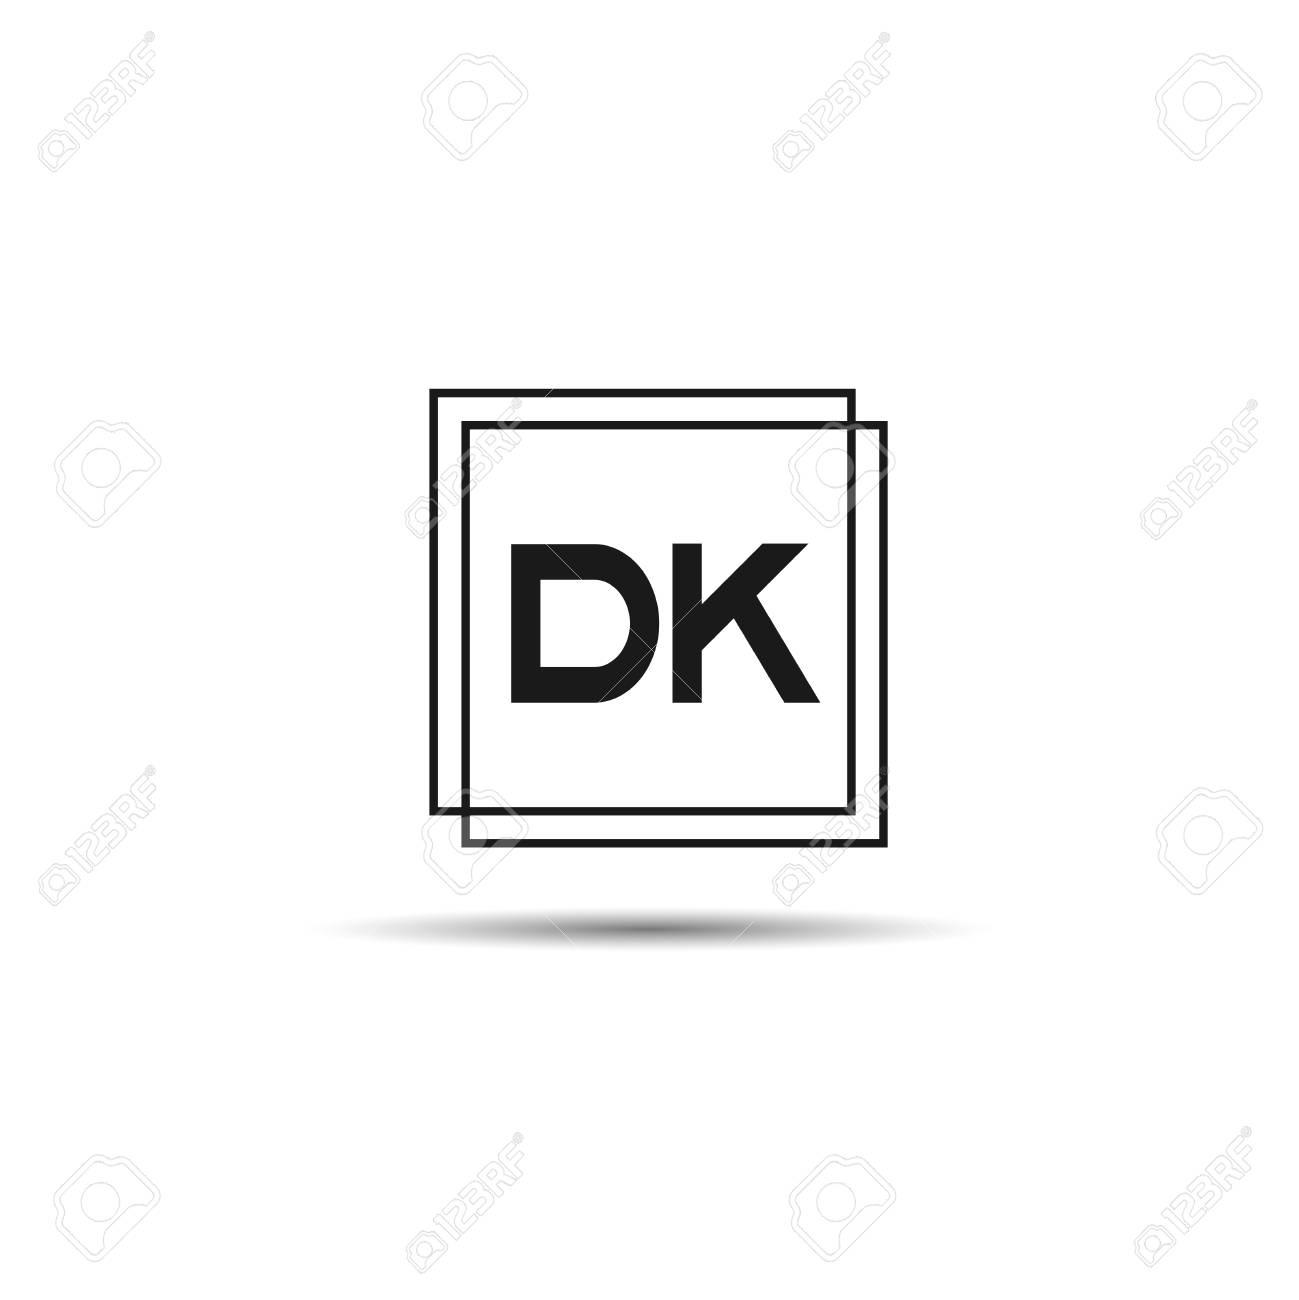 Initial Letter DK Logo Template Design - 108067326